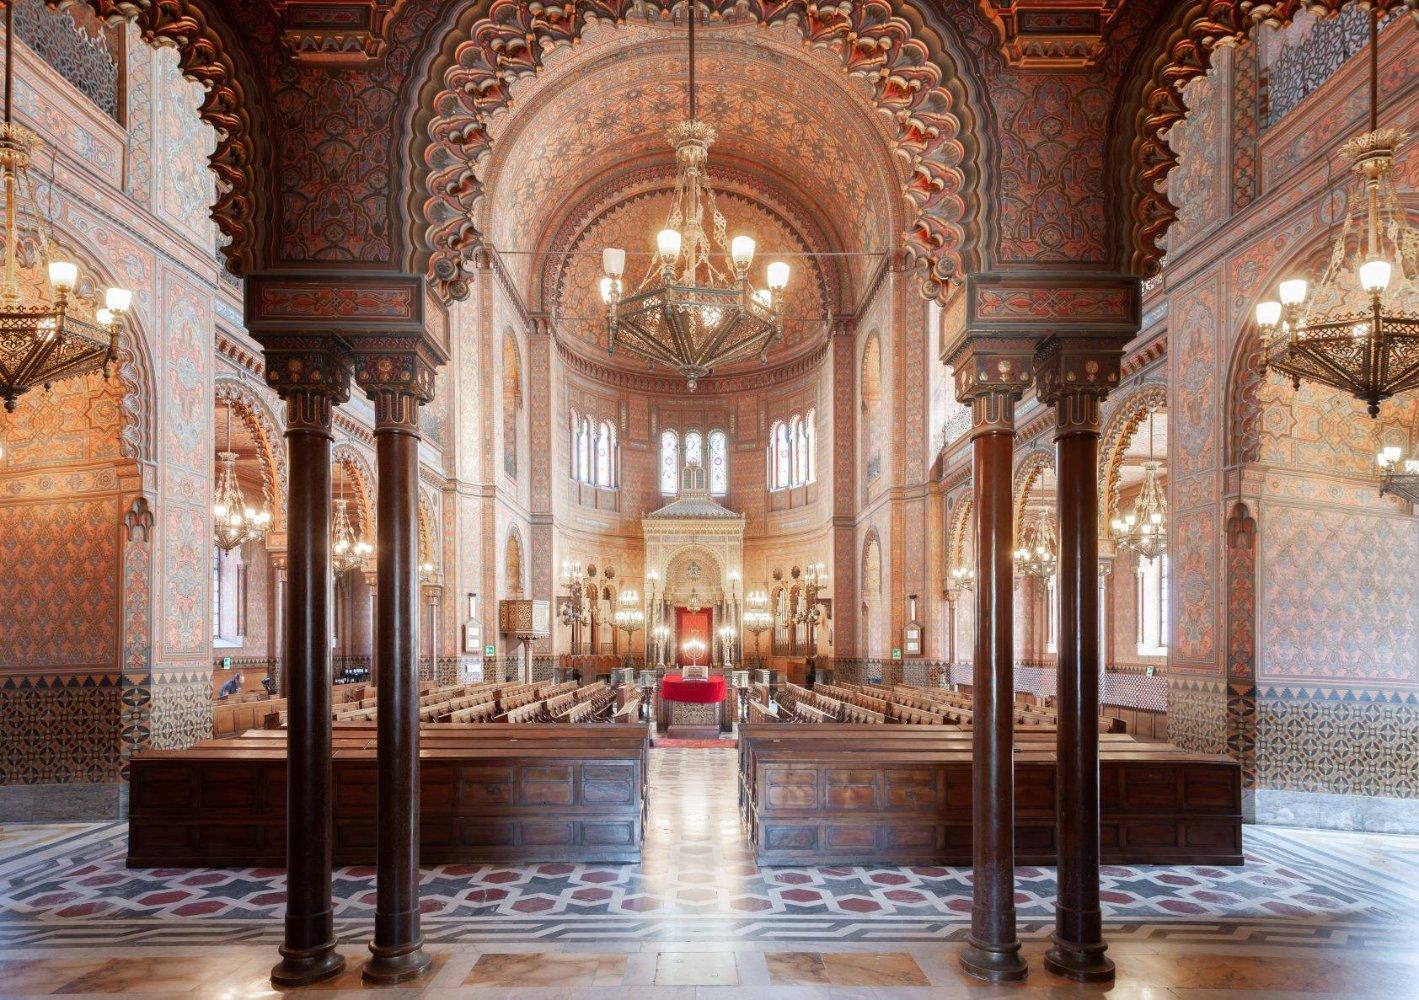 Sinagoga e museo di arte e storia ebraica, Firenze